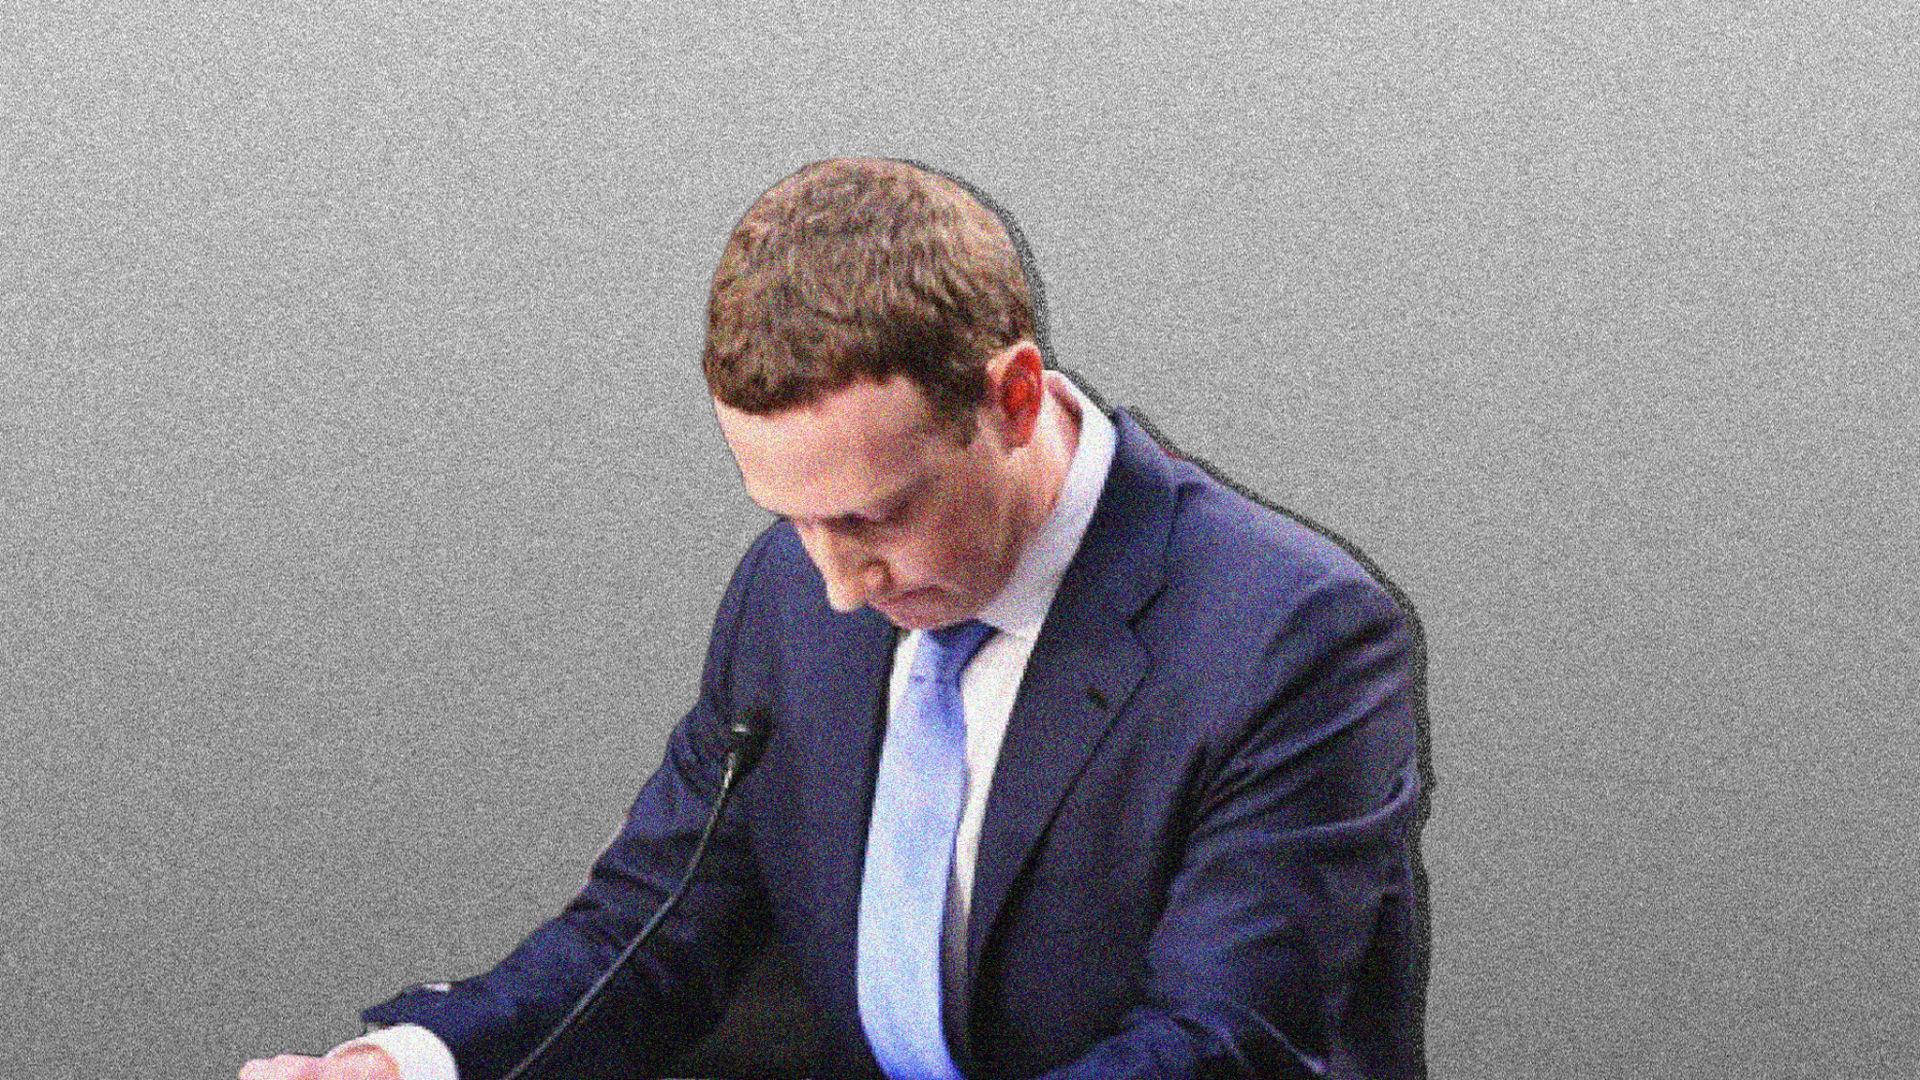 Facebook founder Mark Zuckerberg.